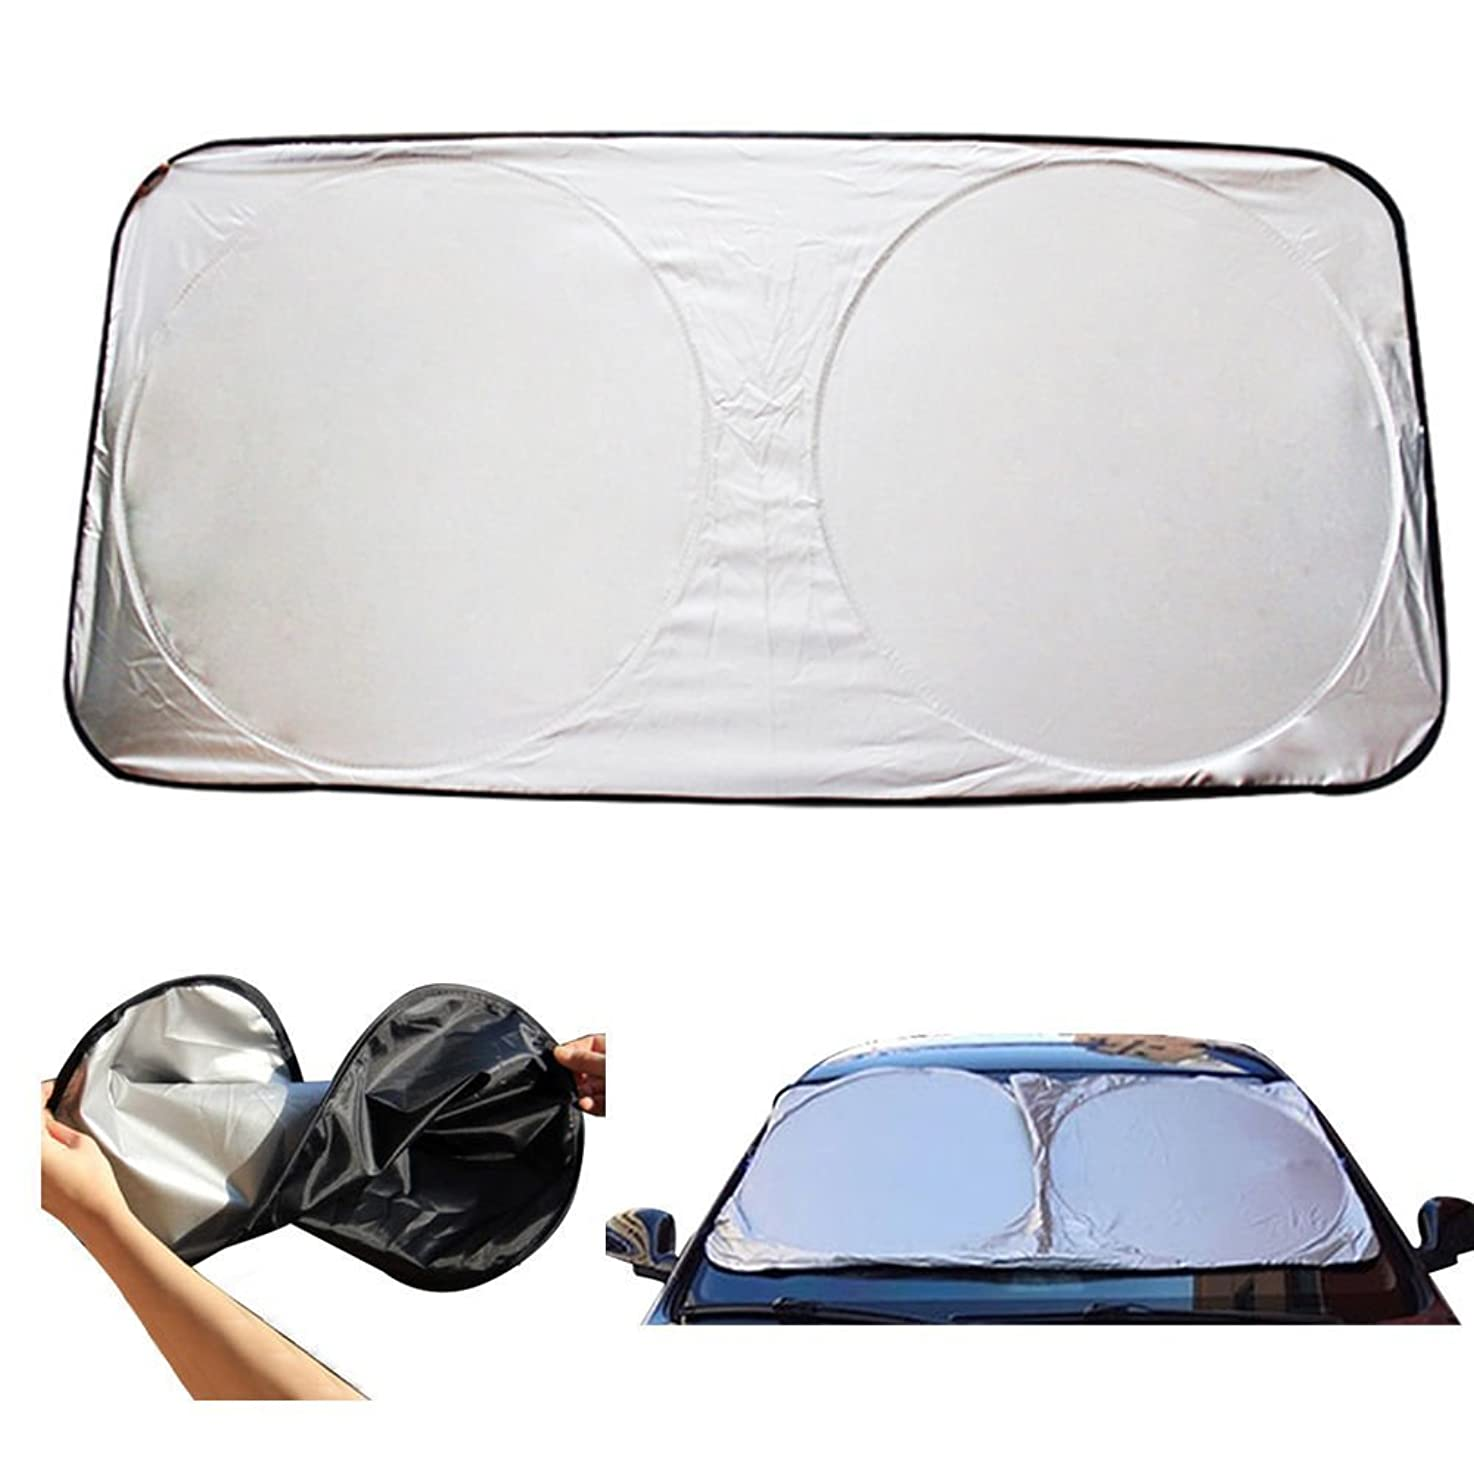 HugeStore Universal Large Silver Car Windscreen Windshield Sun Shade Visor Heat Reflective Front Rear Window